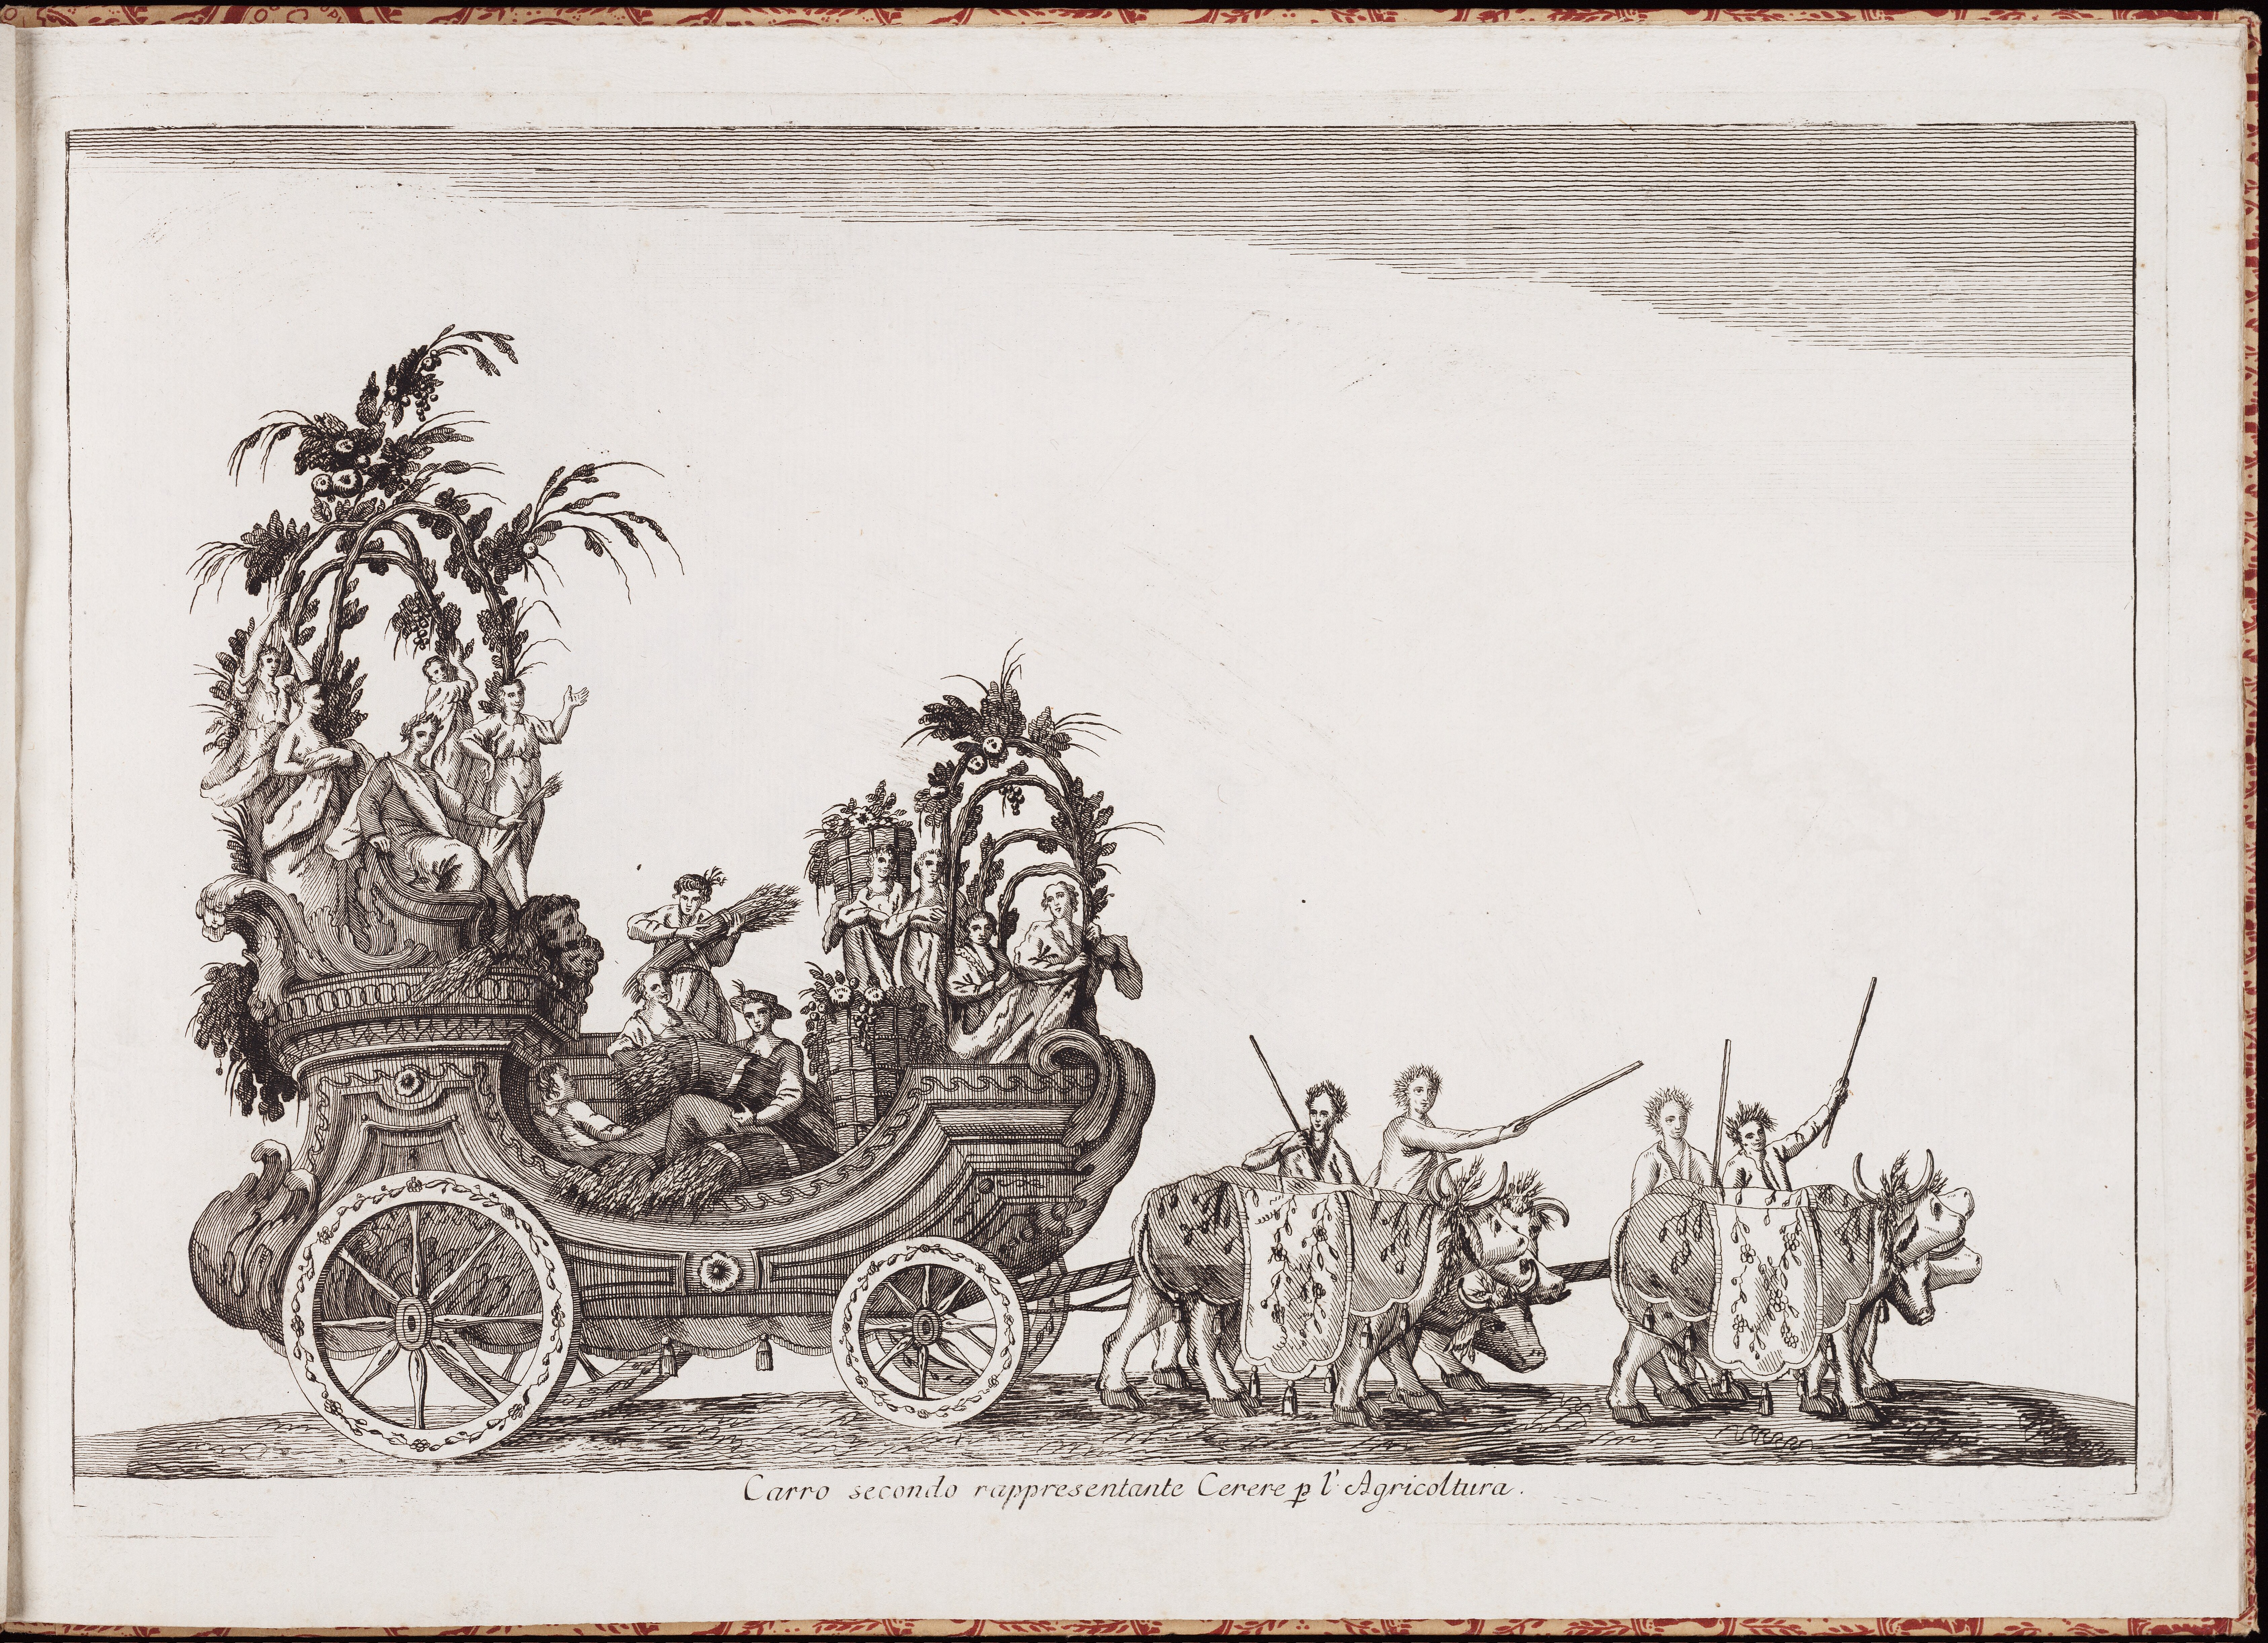 Вторая колесница — богини плодородия Цереры